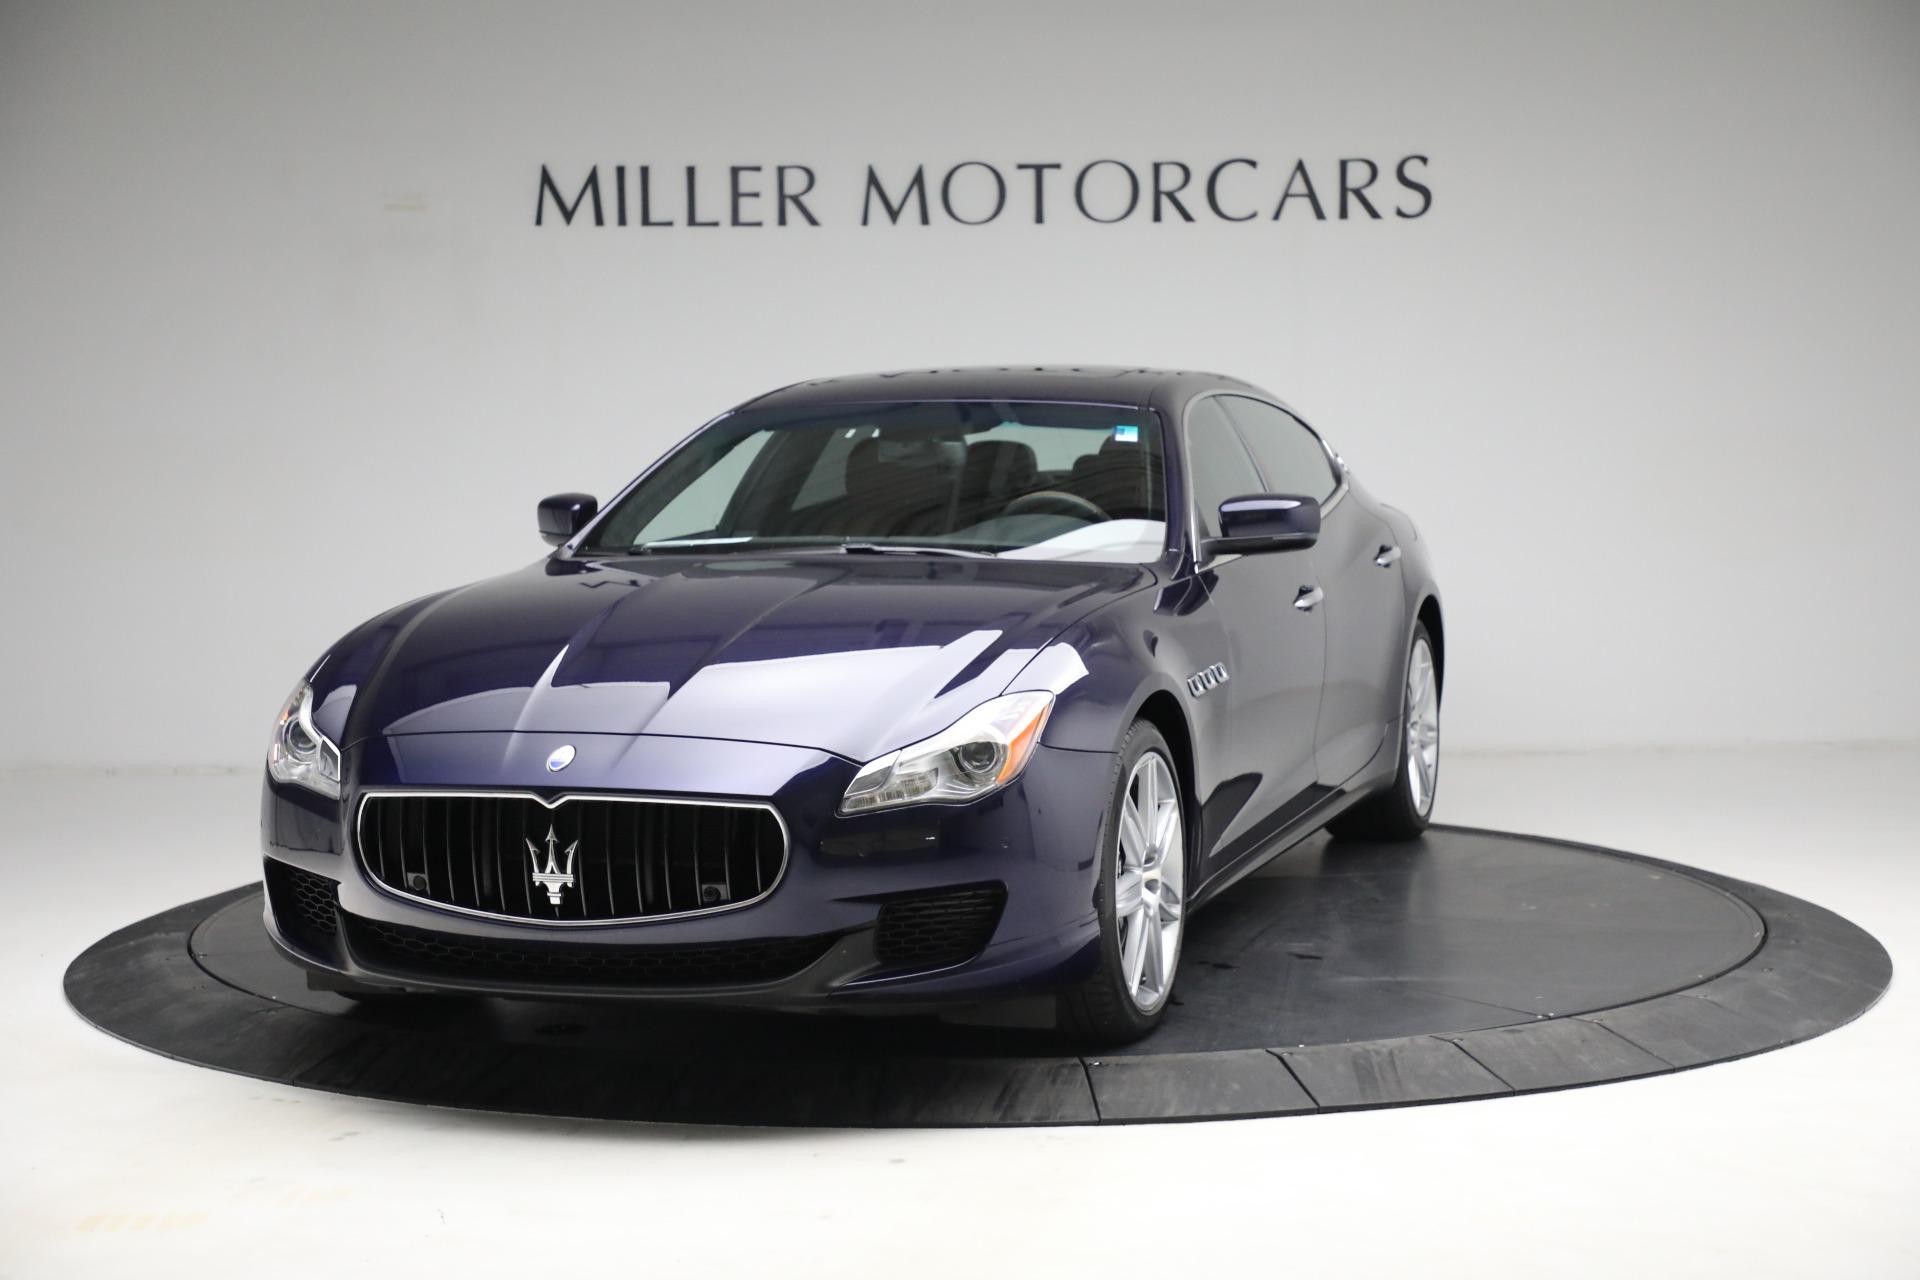 Used 2014 Maserati Quattroporte S Q4 for sale $42,900 at McLaren Greenwich in Greenwich CT 06830 1